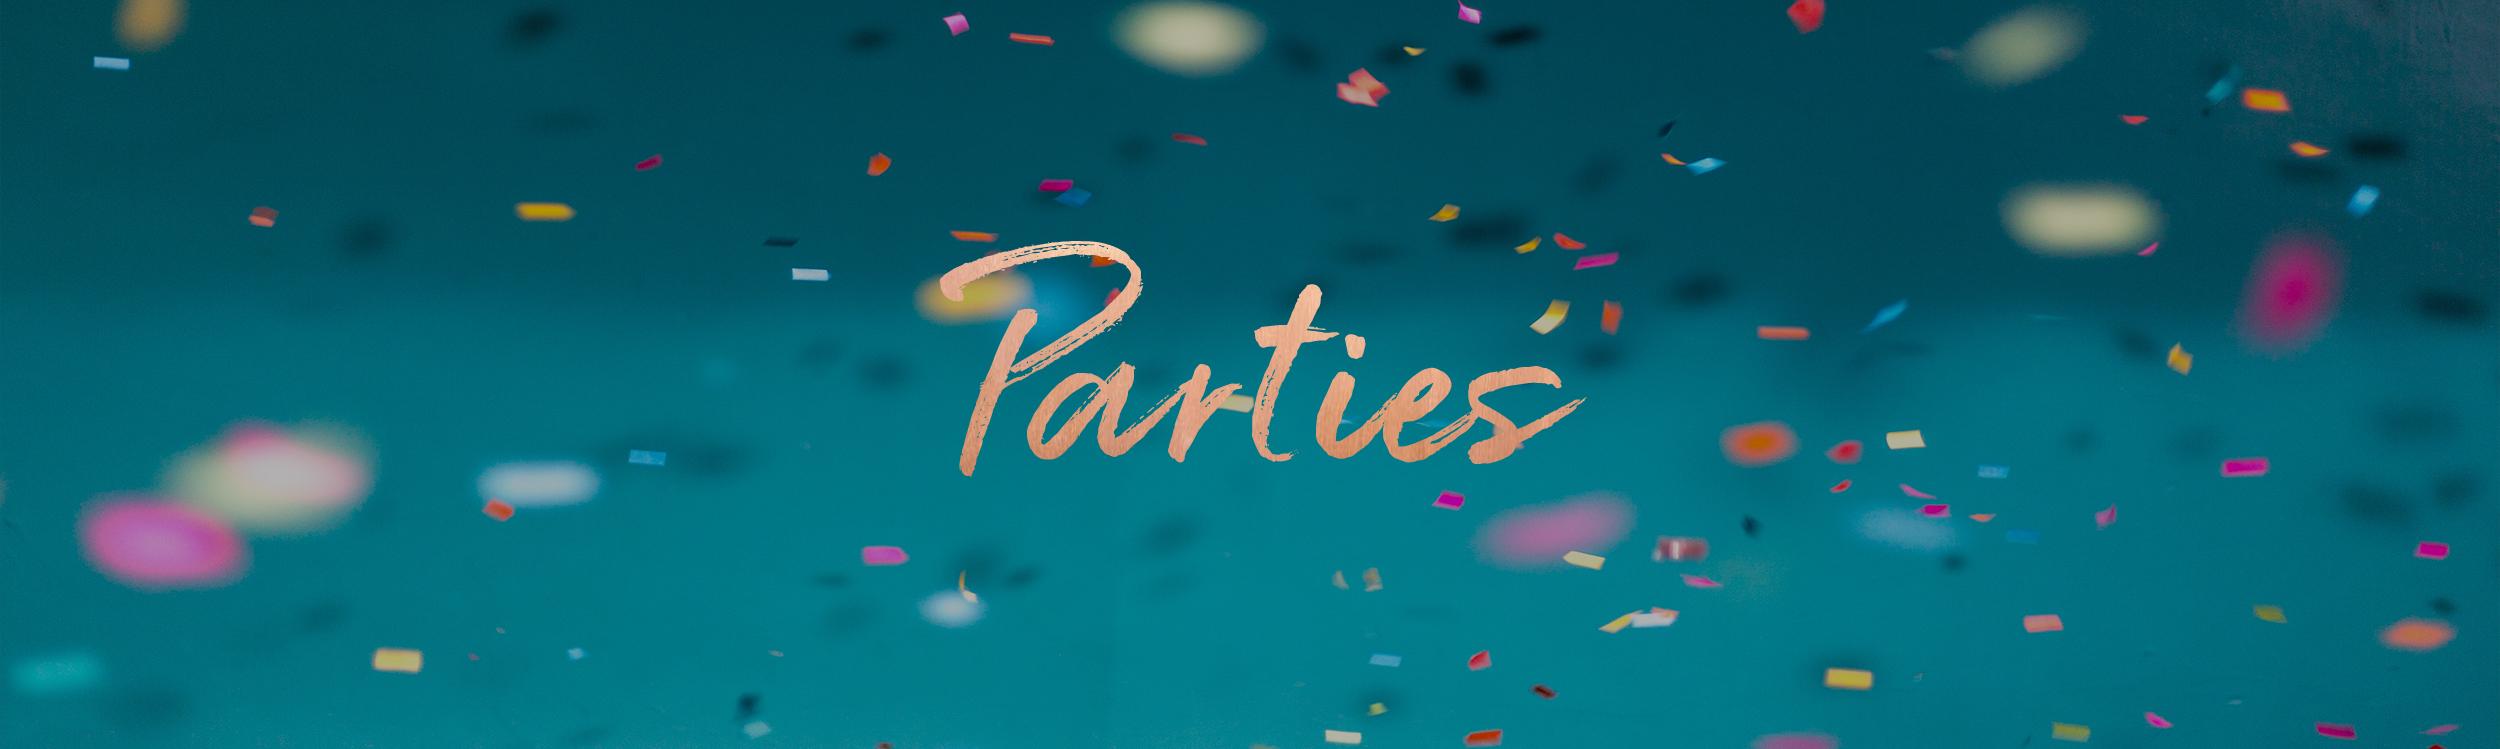 Parties-banner-2.jpg